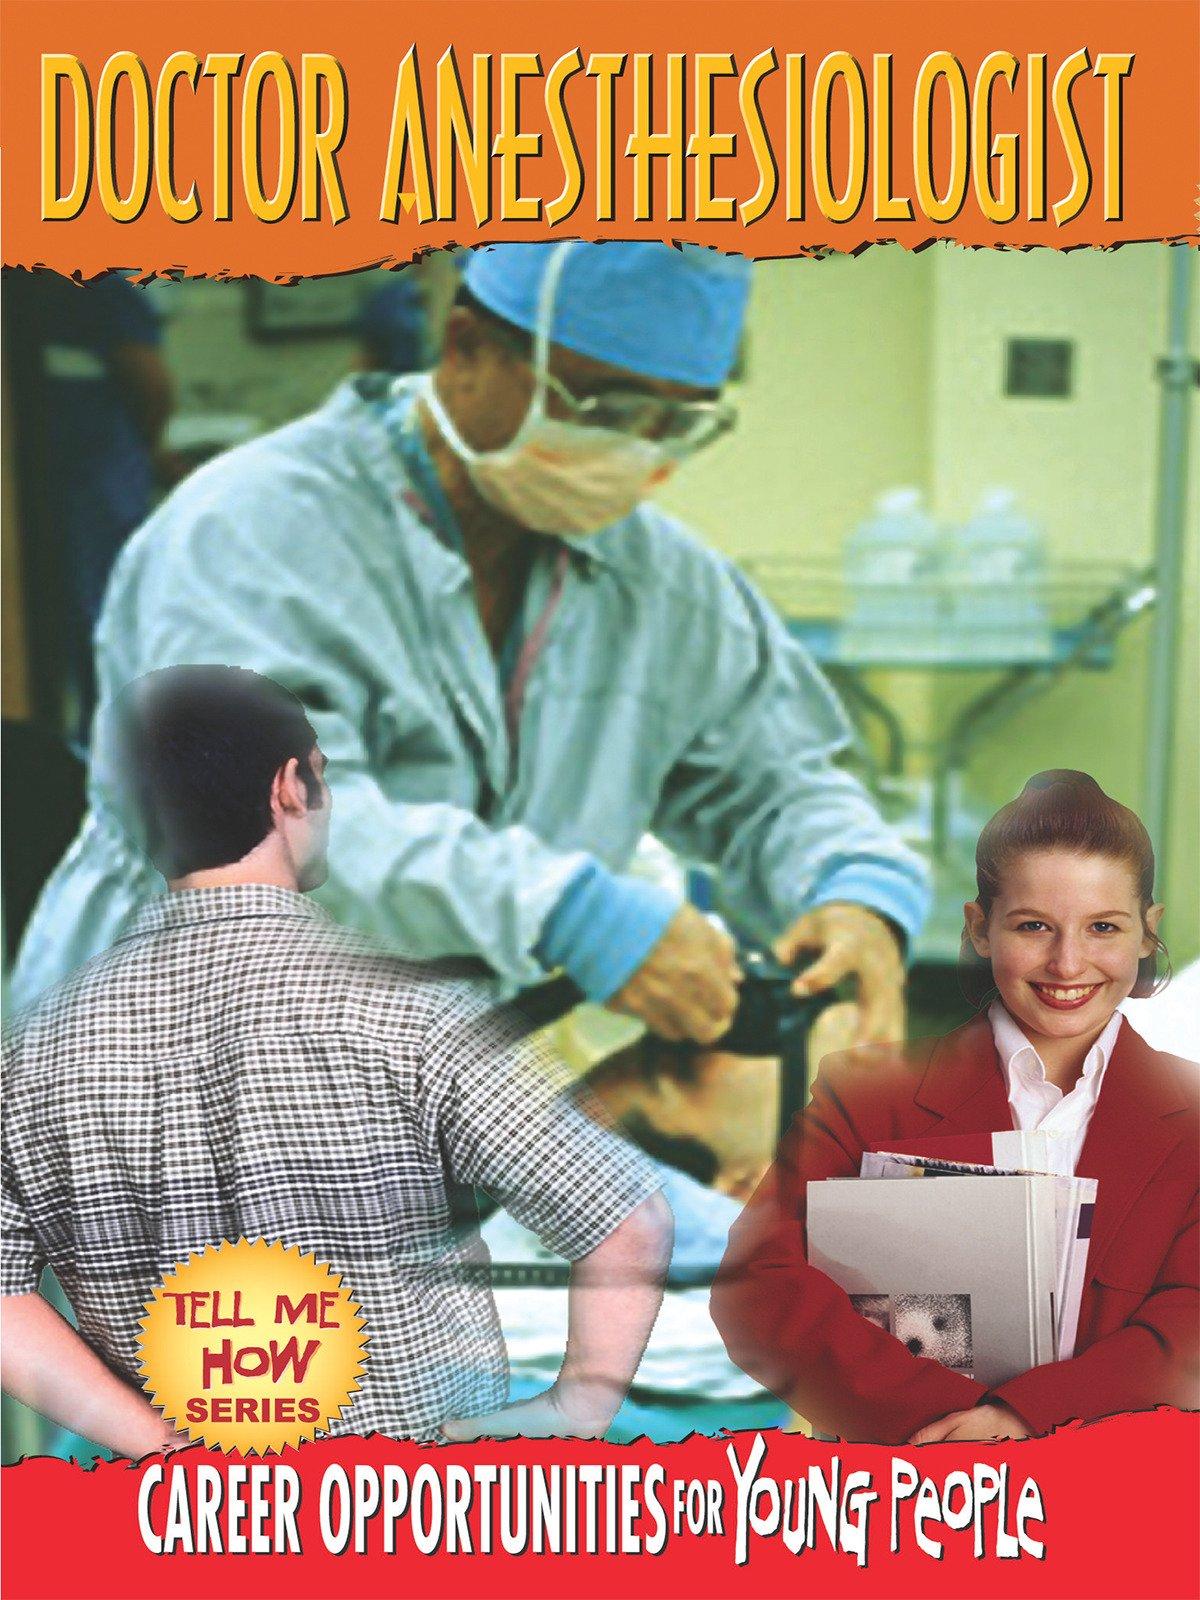 Tell Me How Career Series: Doctor